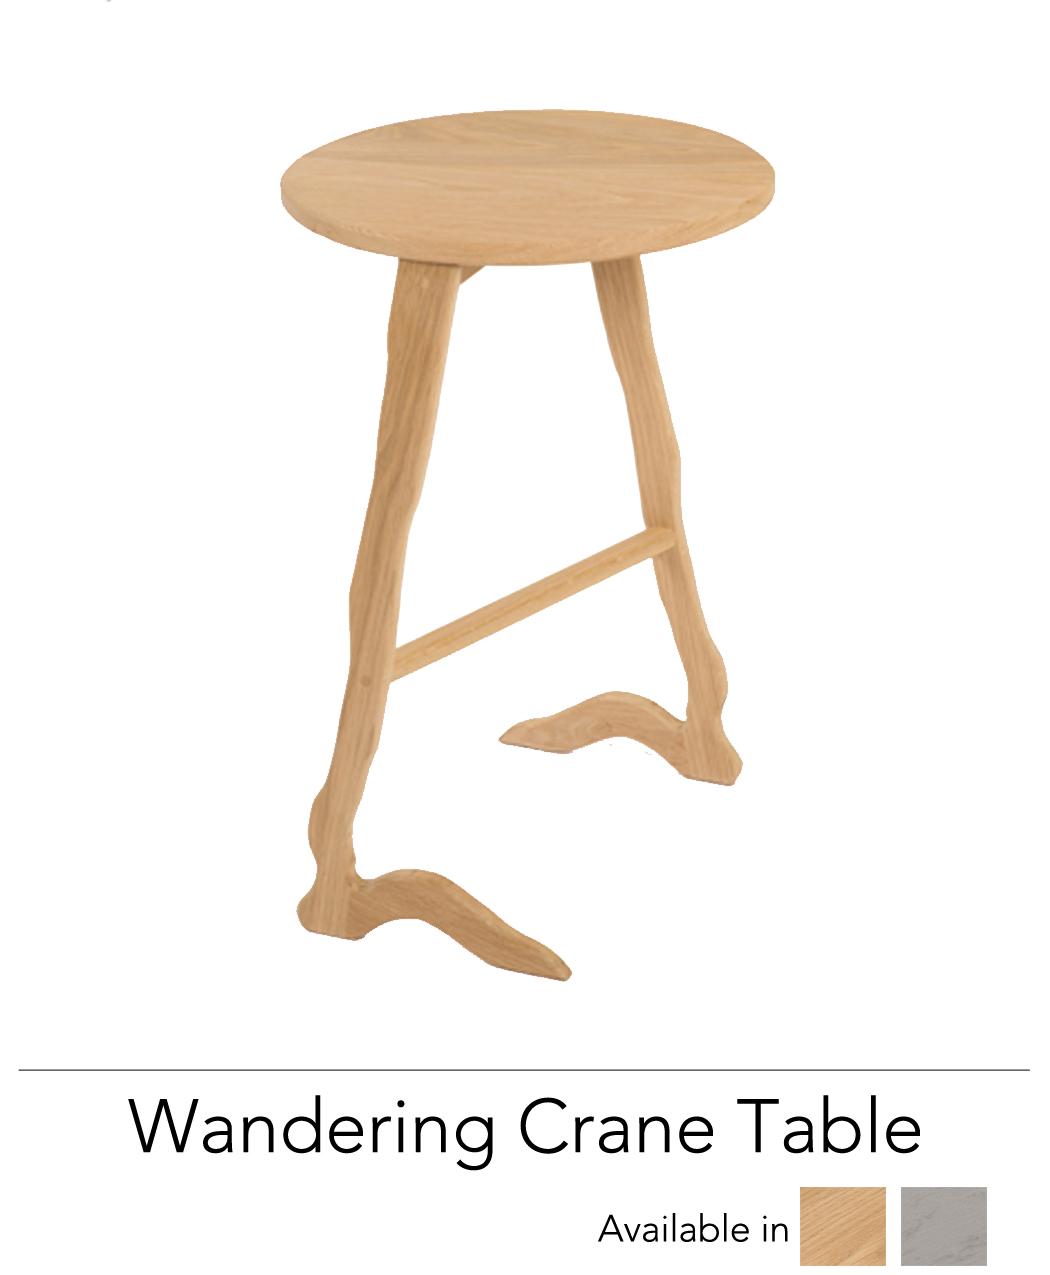 Wandering Crane Table Front New.jpg